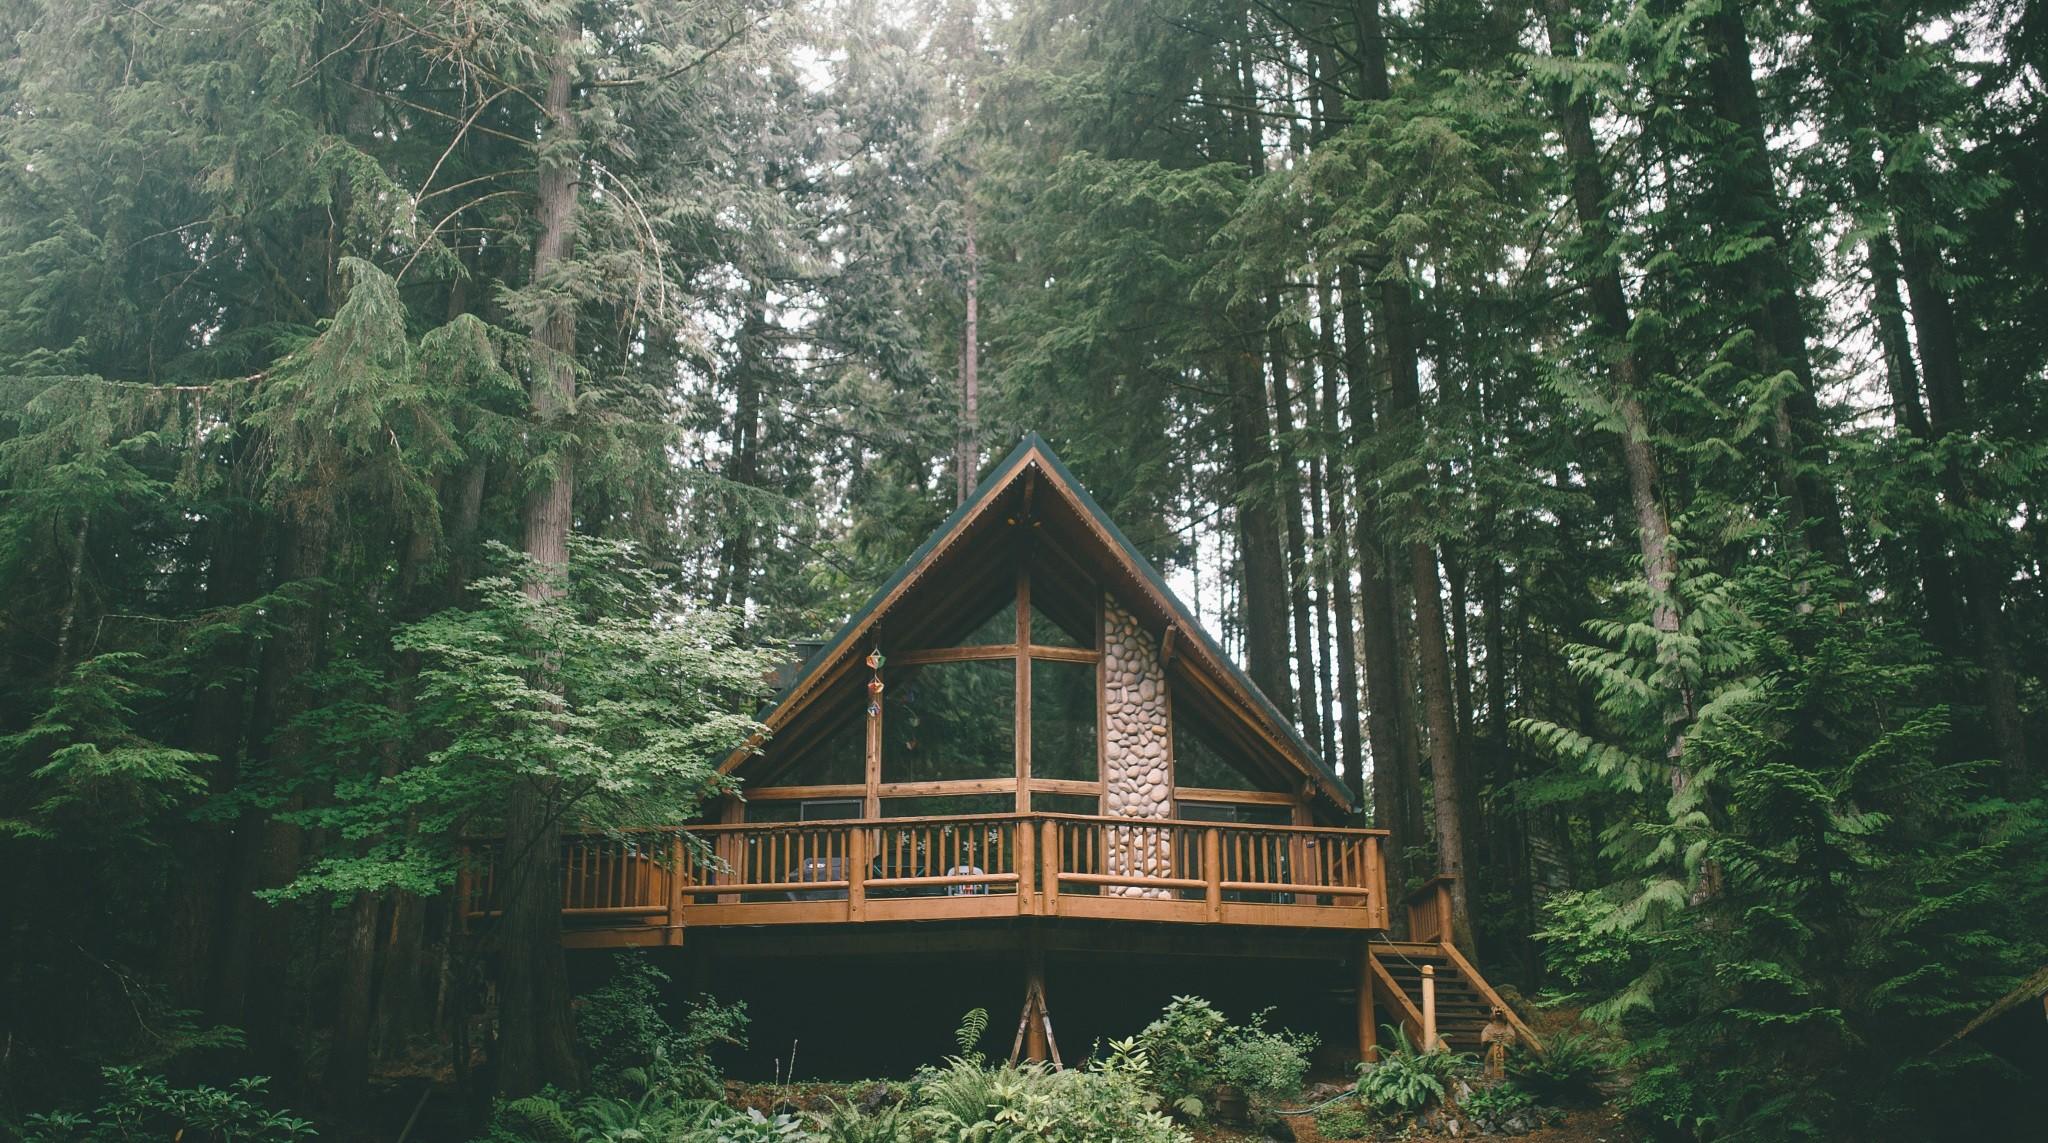 Wallpaper Forest Nature Building Hut Wilderness